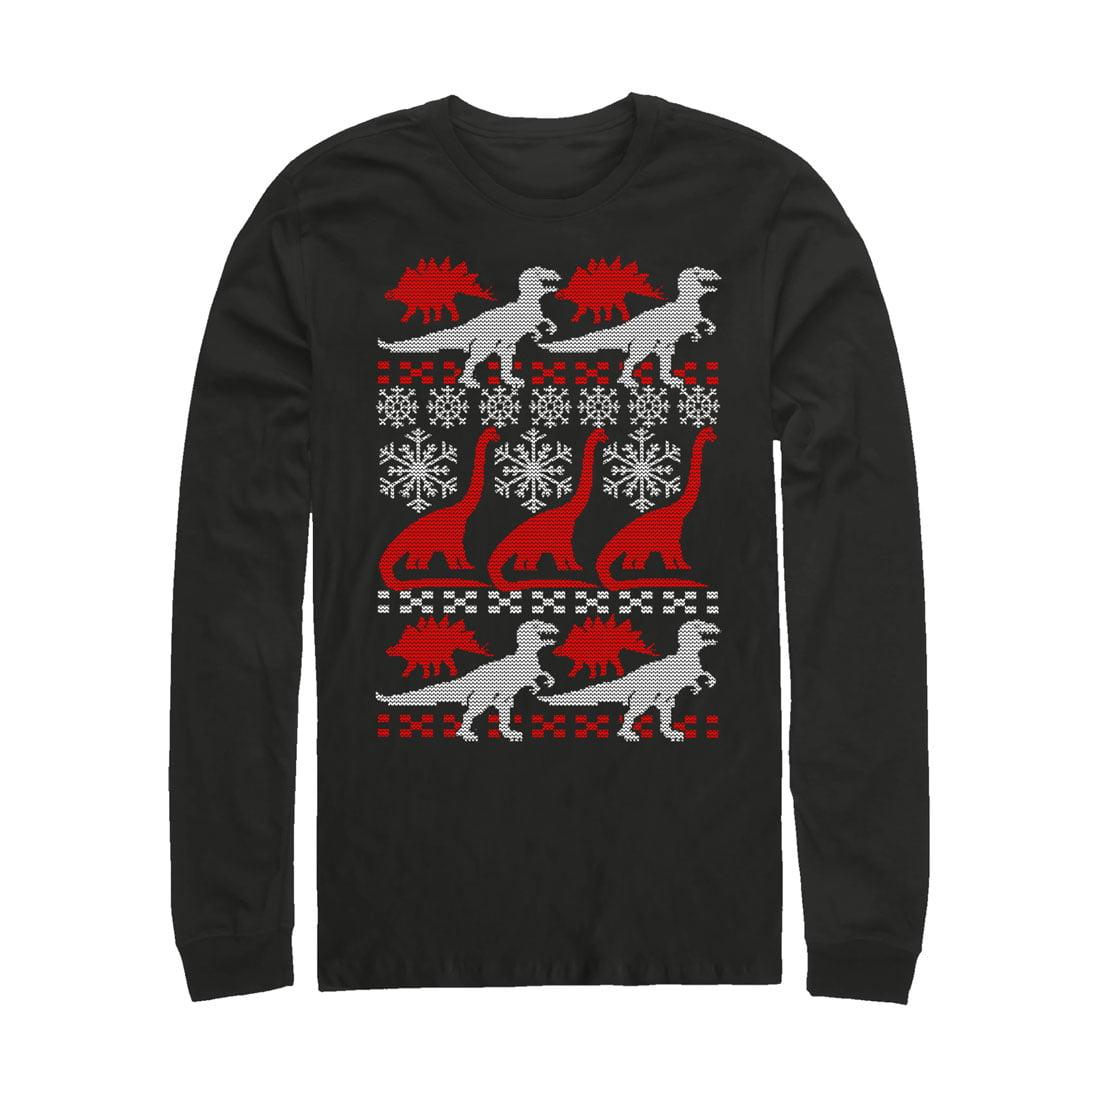 Men's Dinosaur Ugly Christmas Sweater Print Long Sleeve T-Shirt